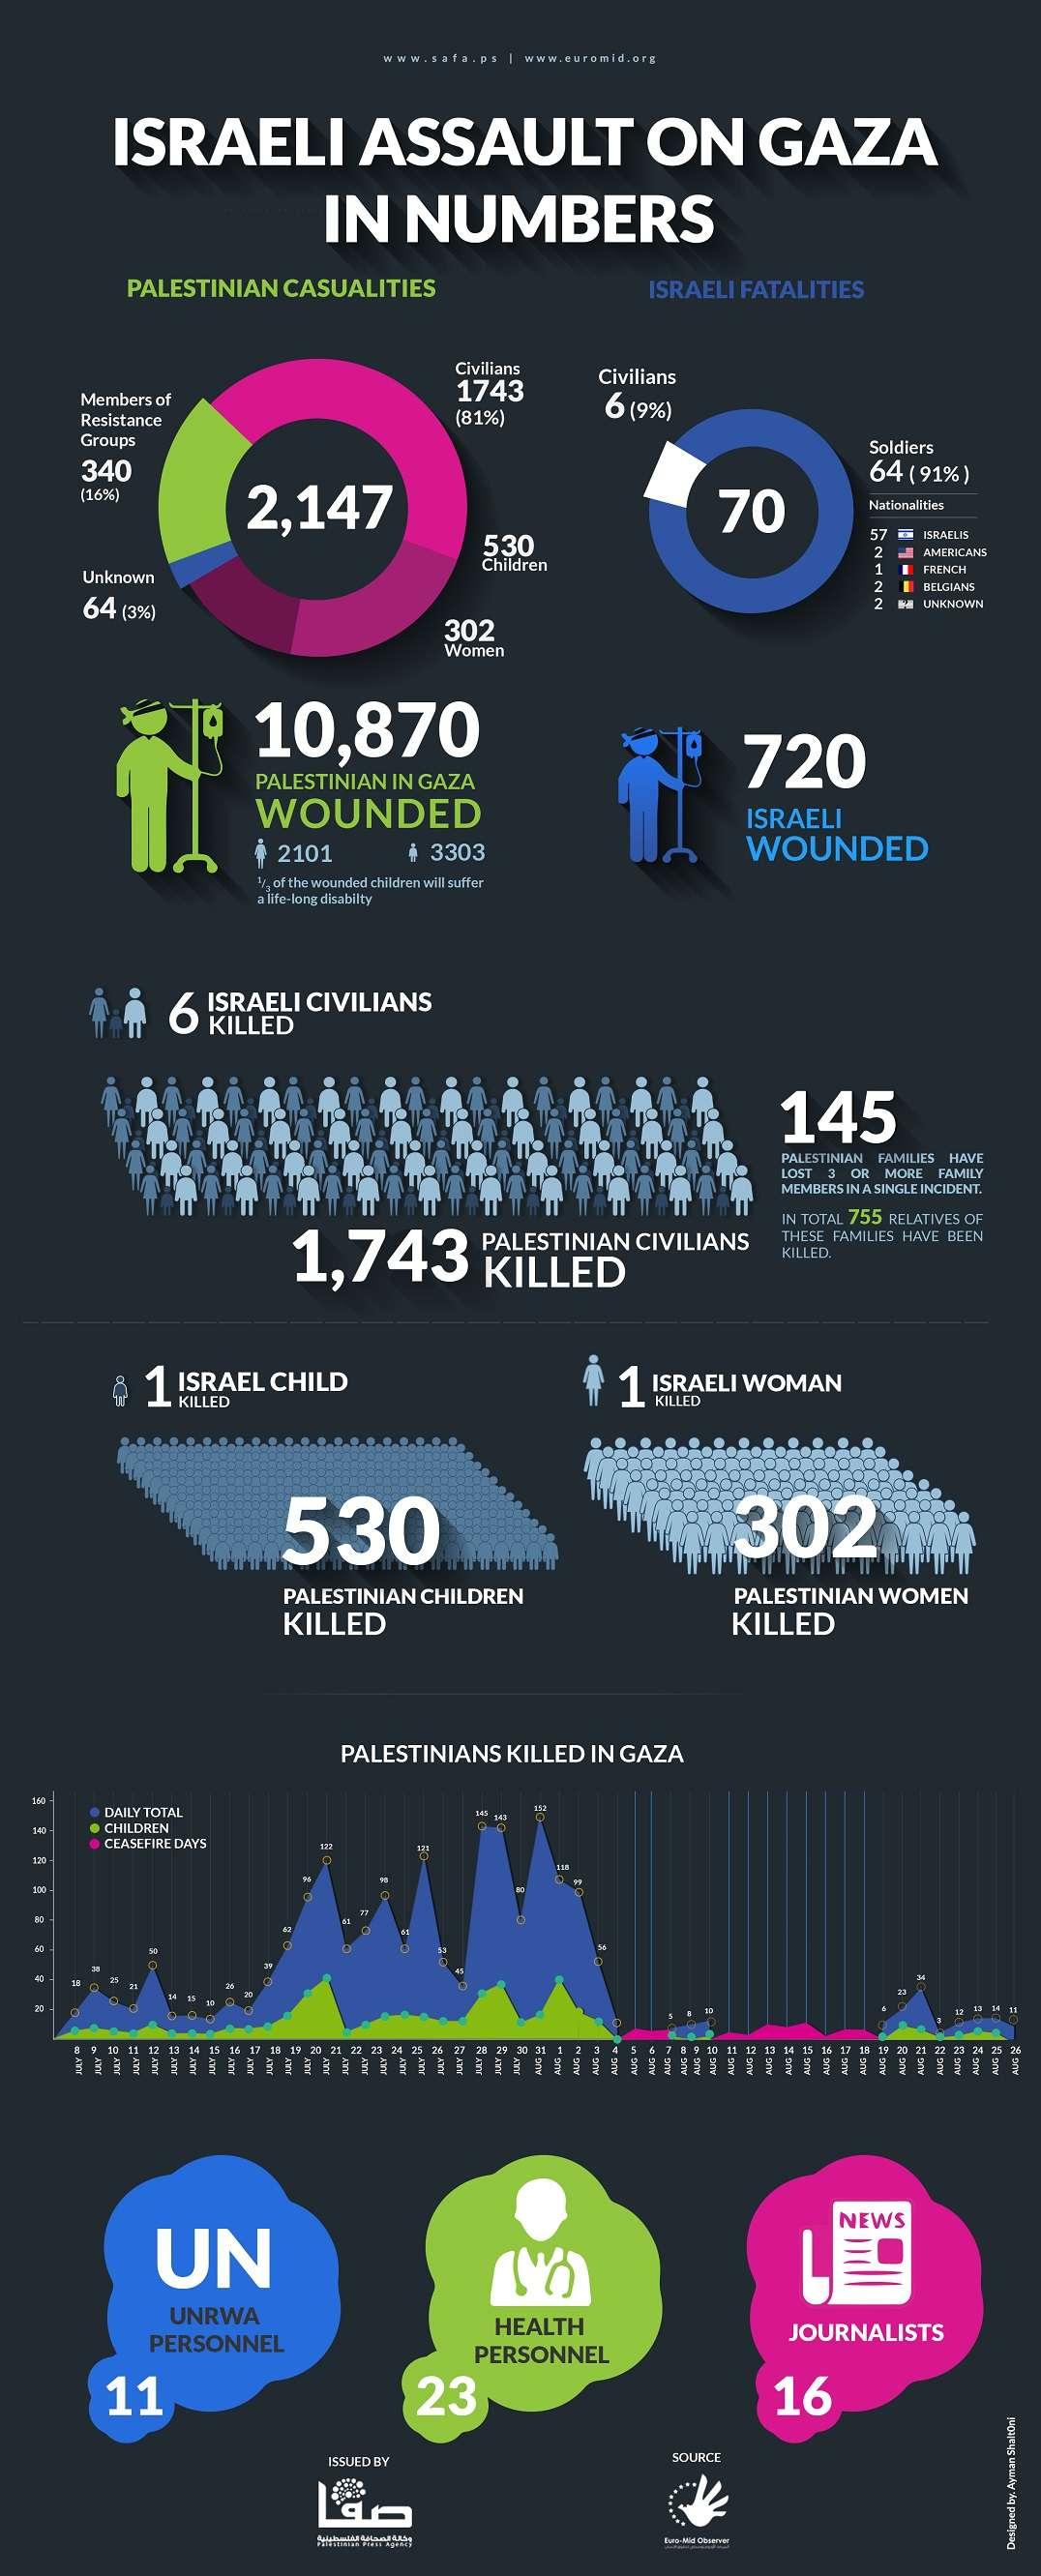 Israeli Assault on Gaza in Numbers